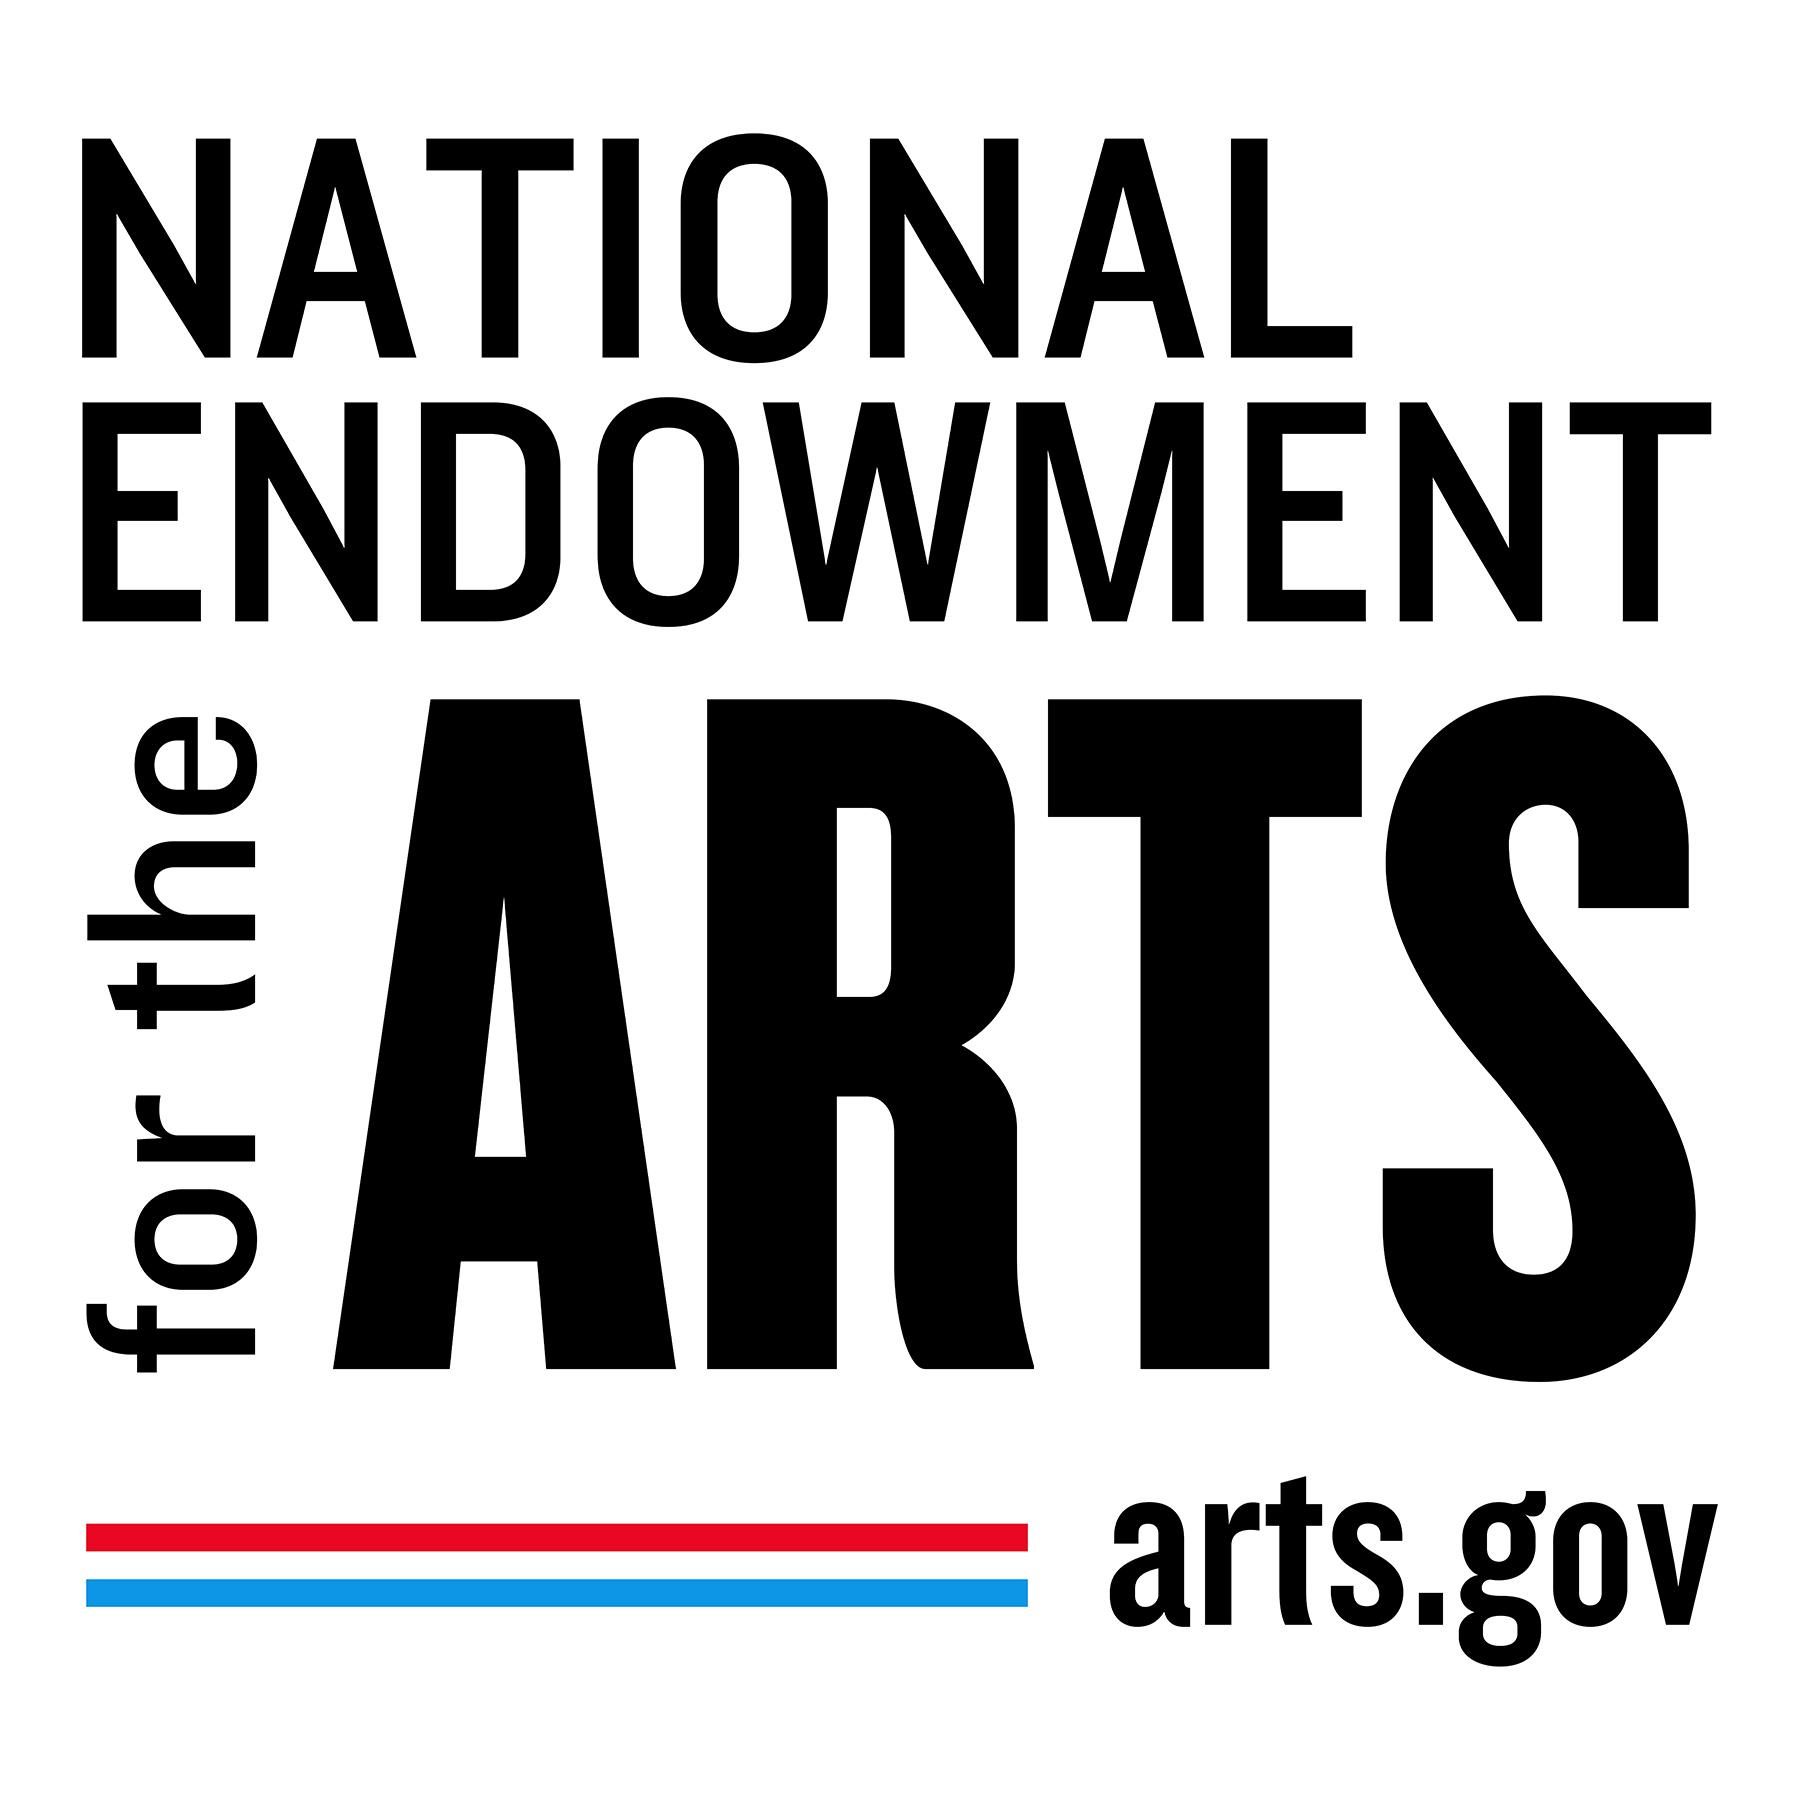 NEA 2018-Square-Logo-with-url2.jpg